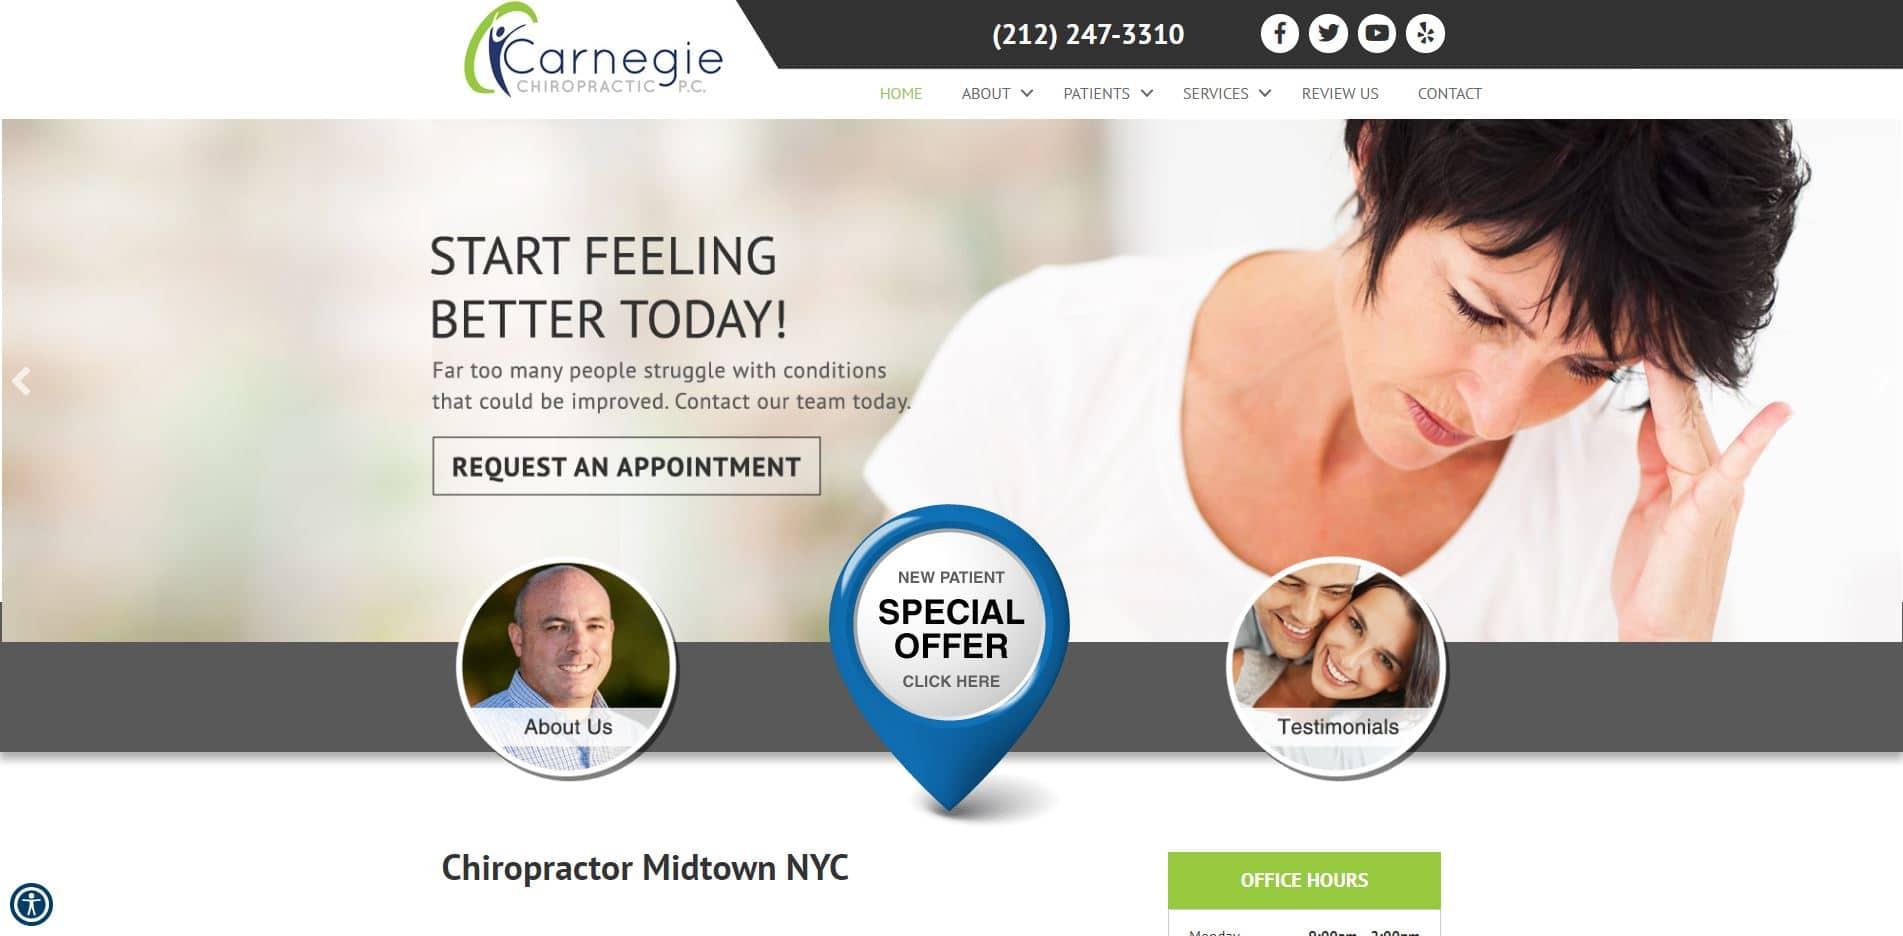 Chiropractor in New York